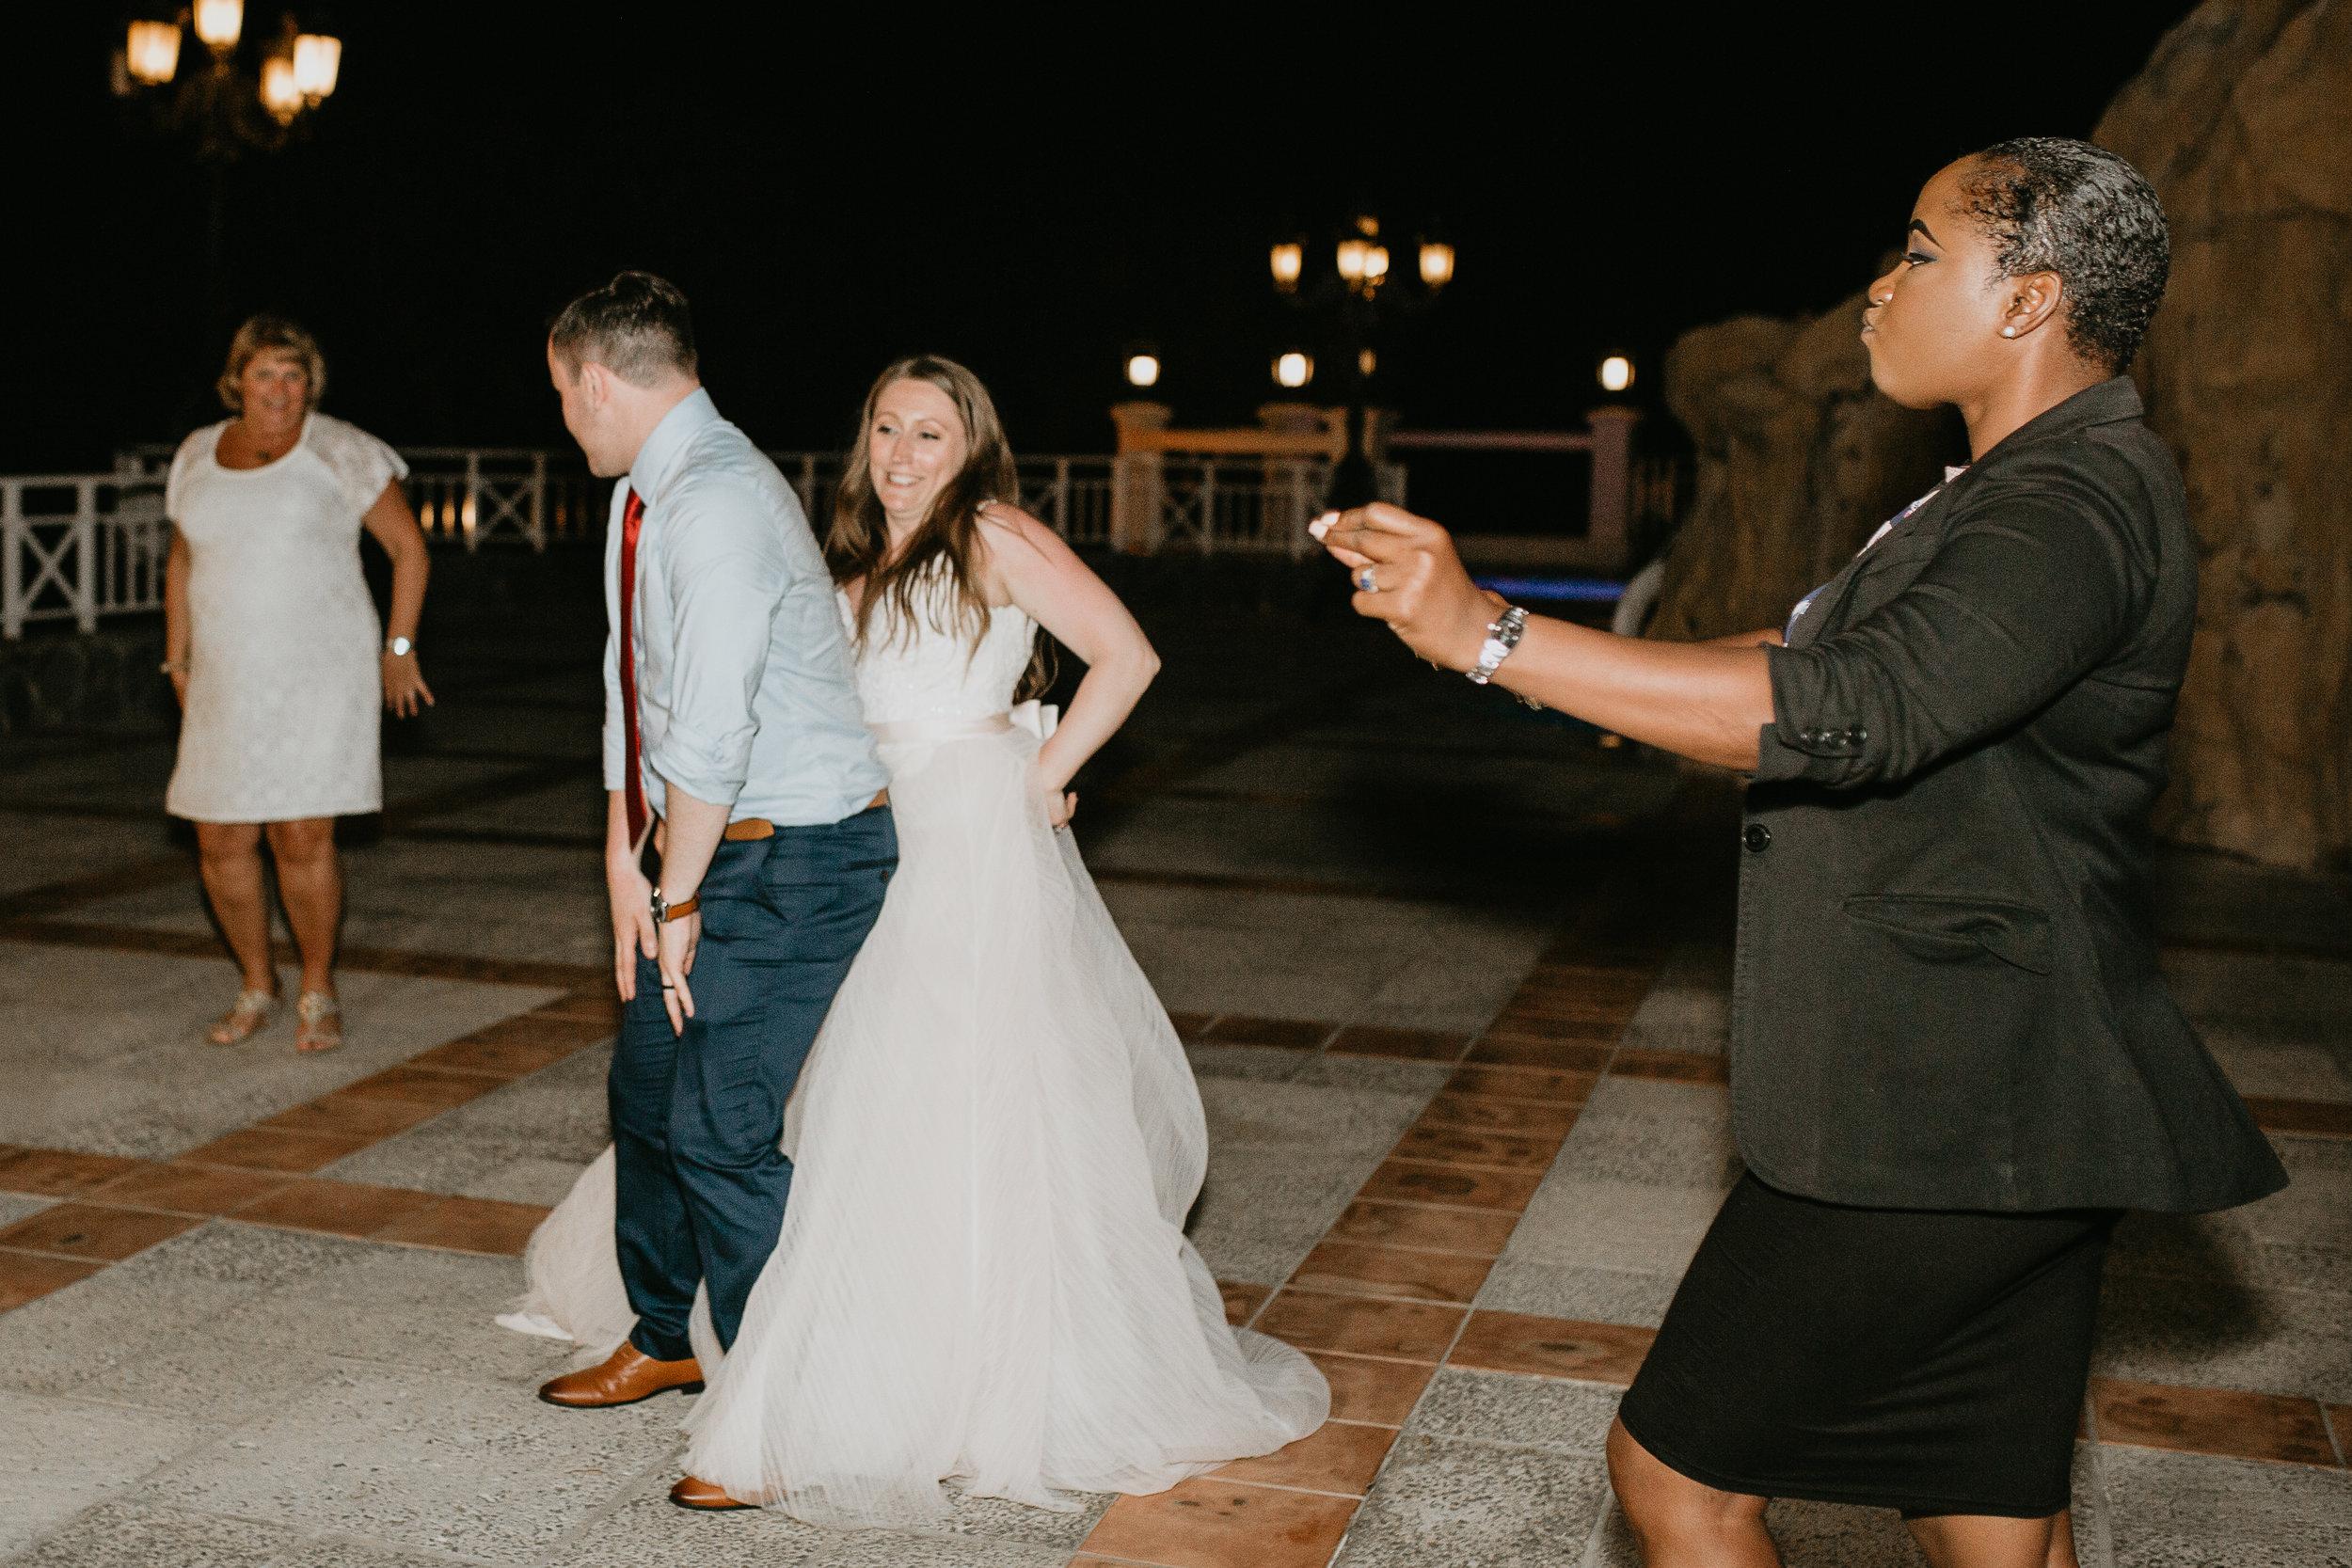 nicole-daacke-photography-destination-wedding-in-st-lucia-sandals-la-toc-intimate-island-wedding-carribean-elopement-photographer-chill-island-wedding-150.jpg